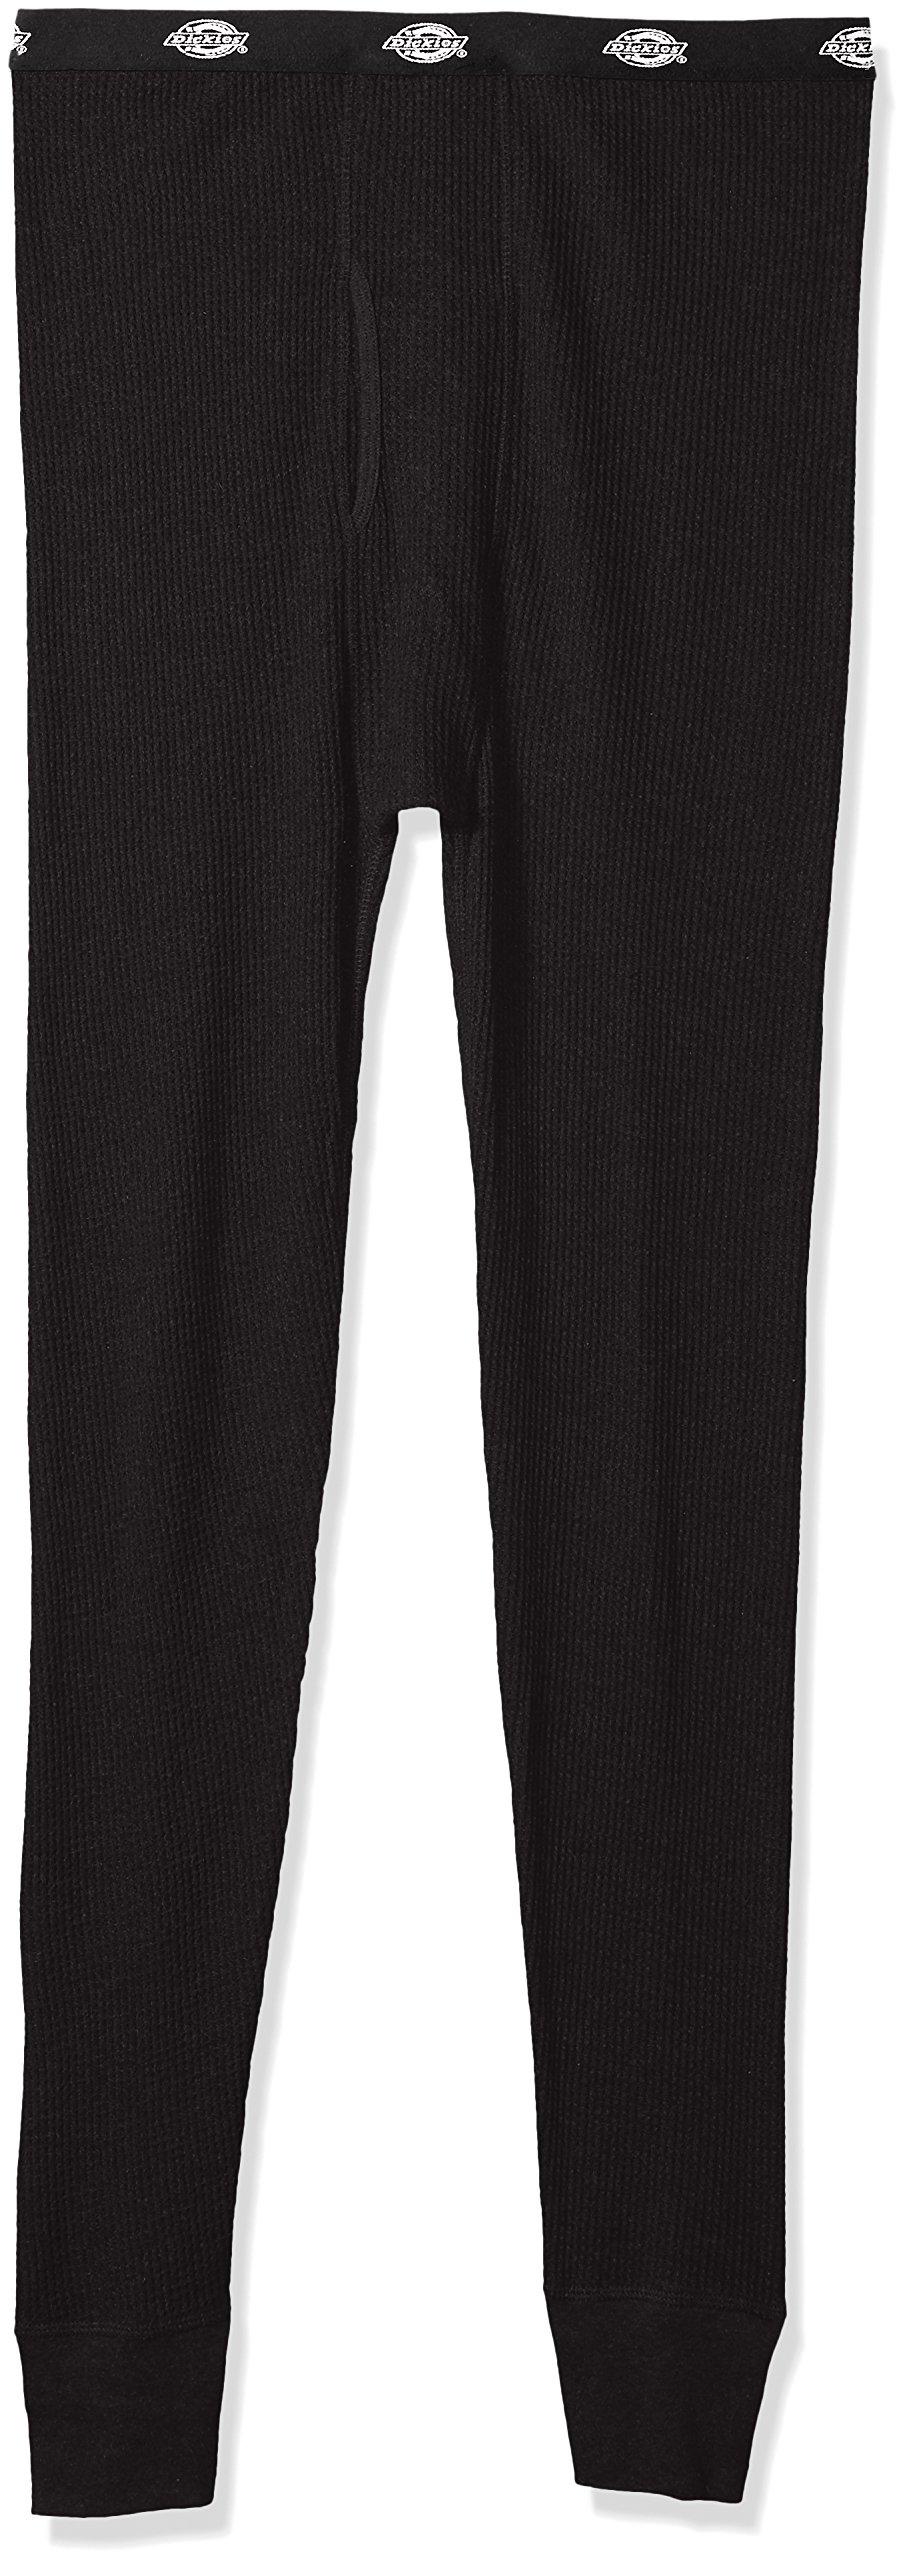 Dickies Men's Big Classic Thermal Waffle Pant, Black, Medium/Tall by Dickies